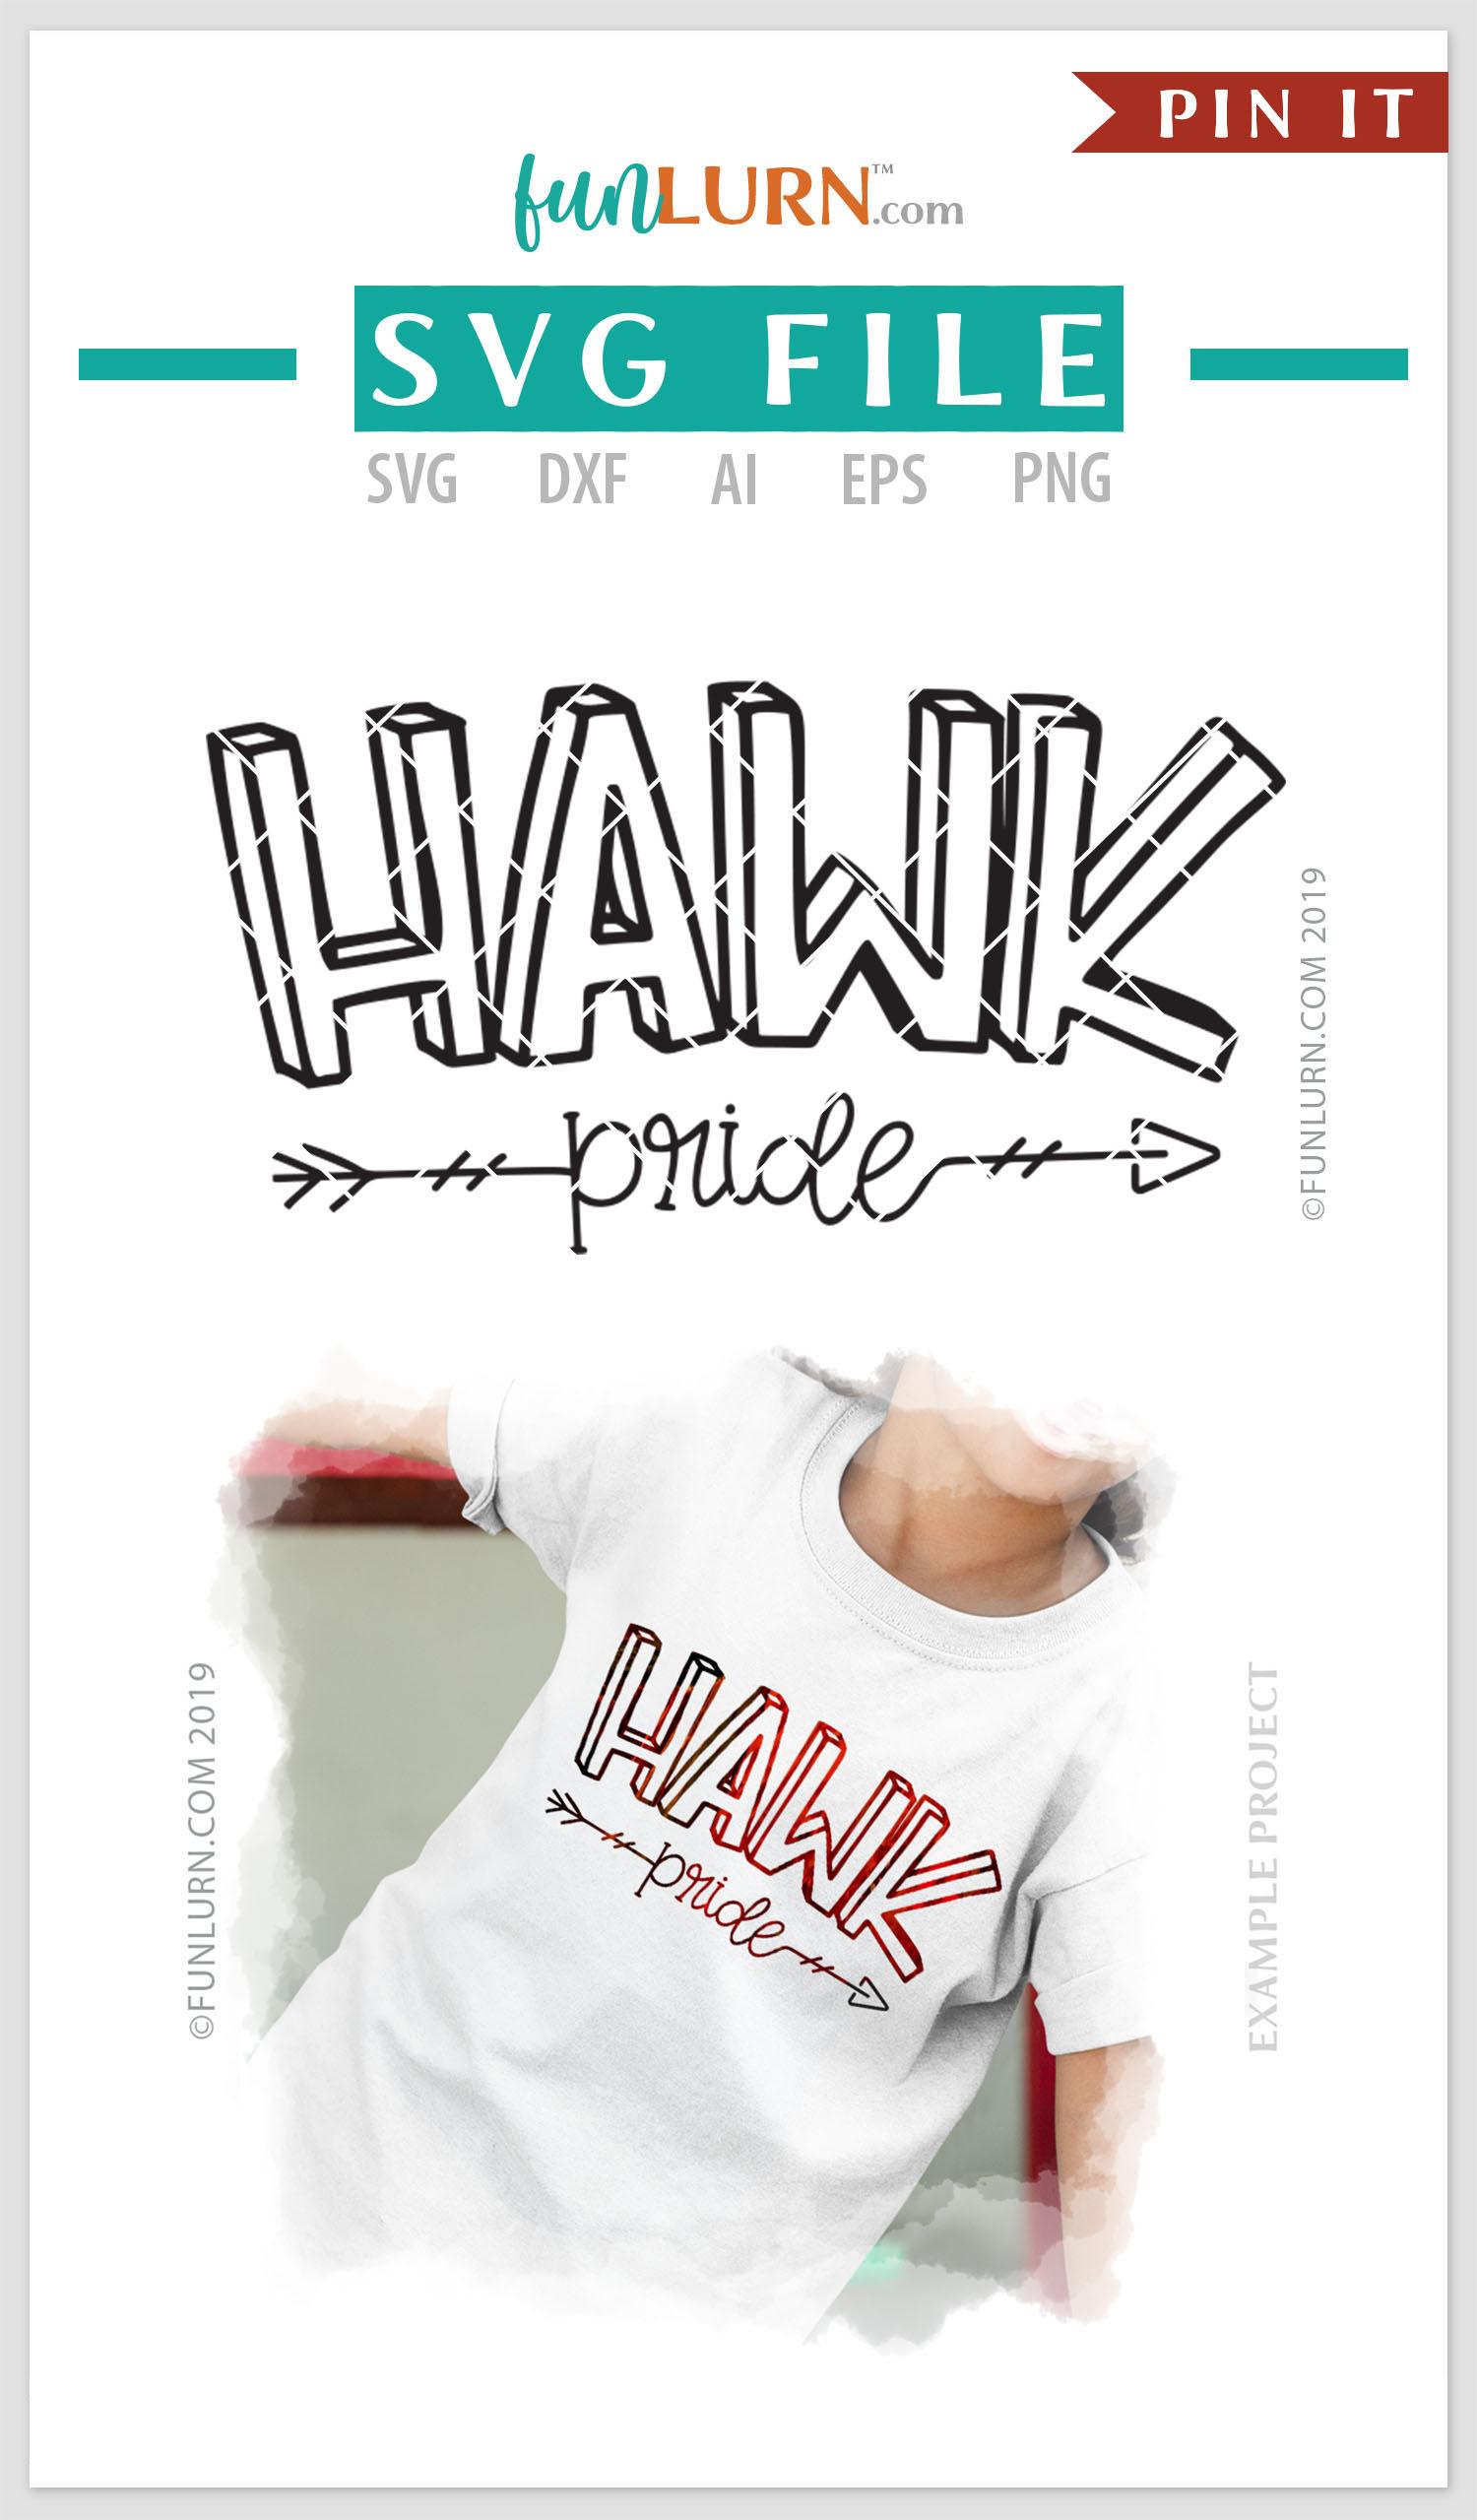 Hawk Pride Team SVG Cut File example image 4